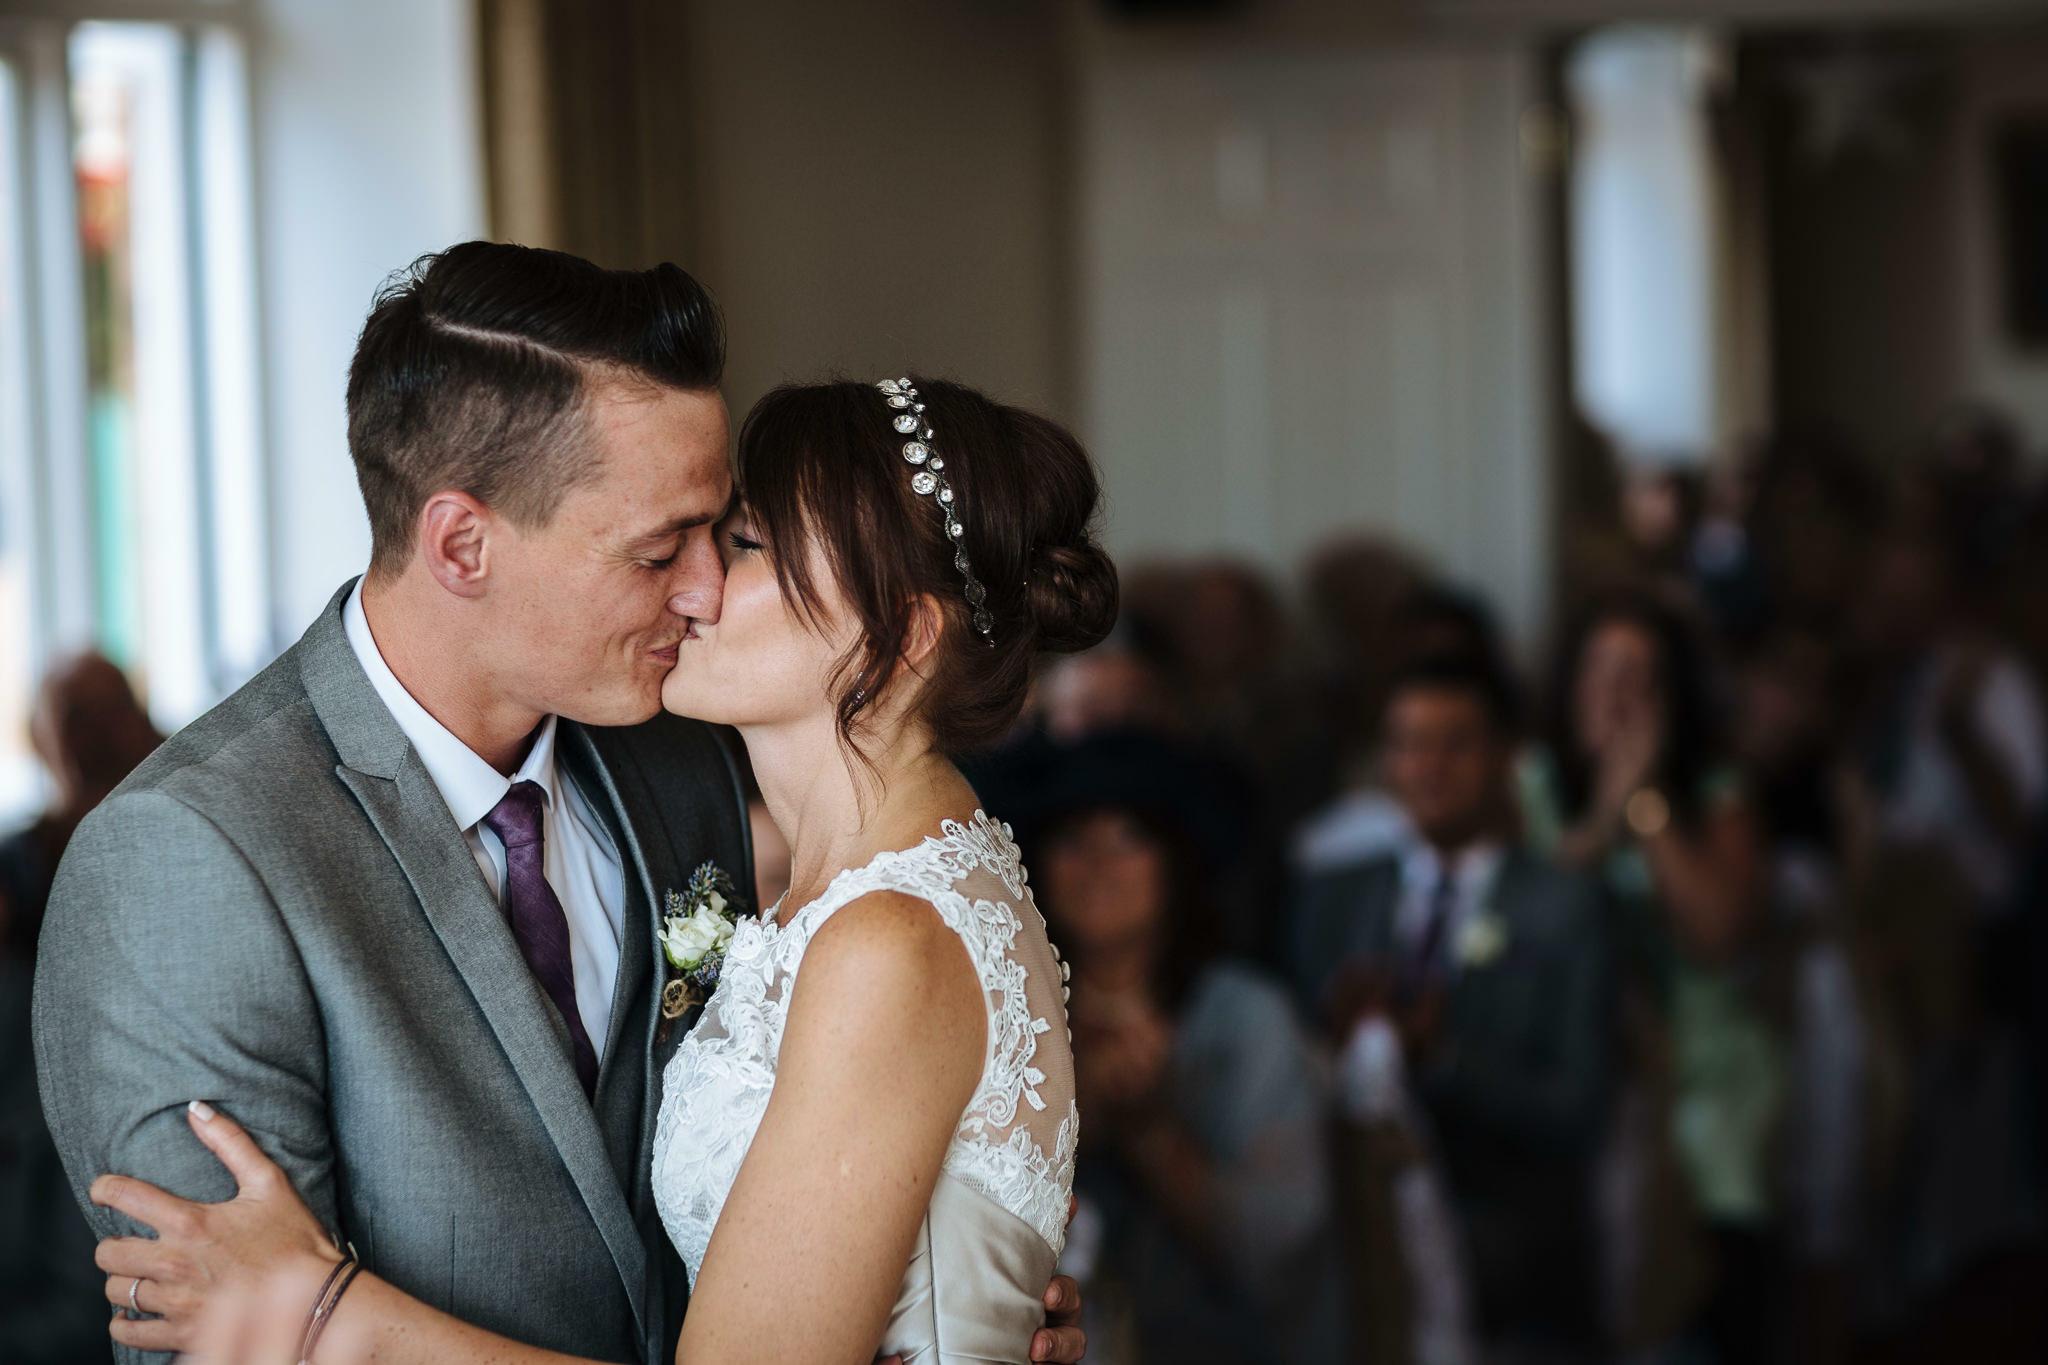 paul-marbrook-Caer-Llan-Wedding-Photographer-90047